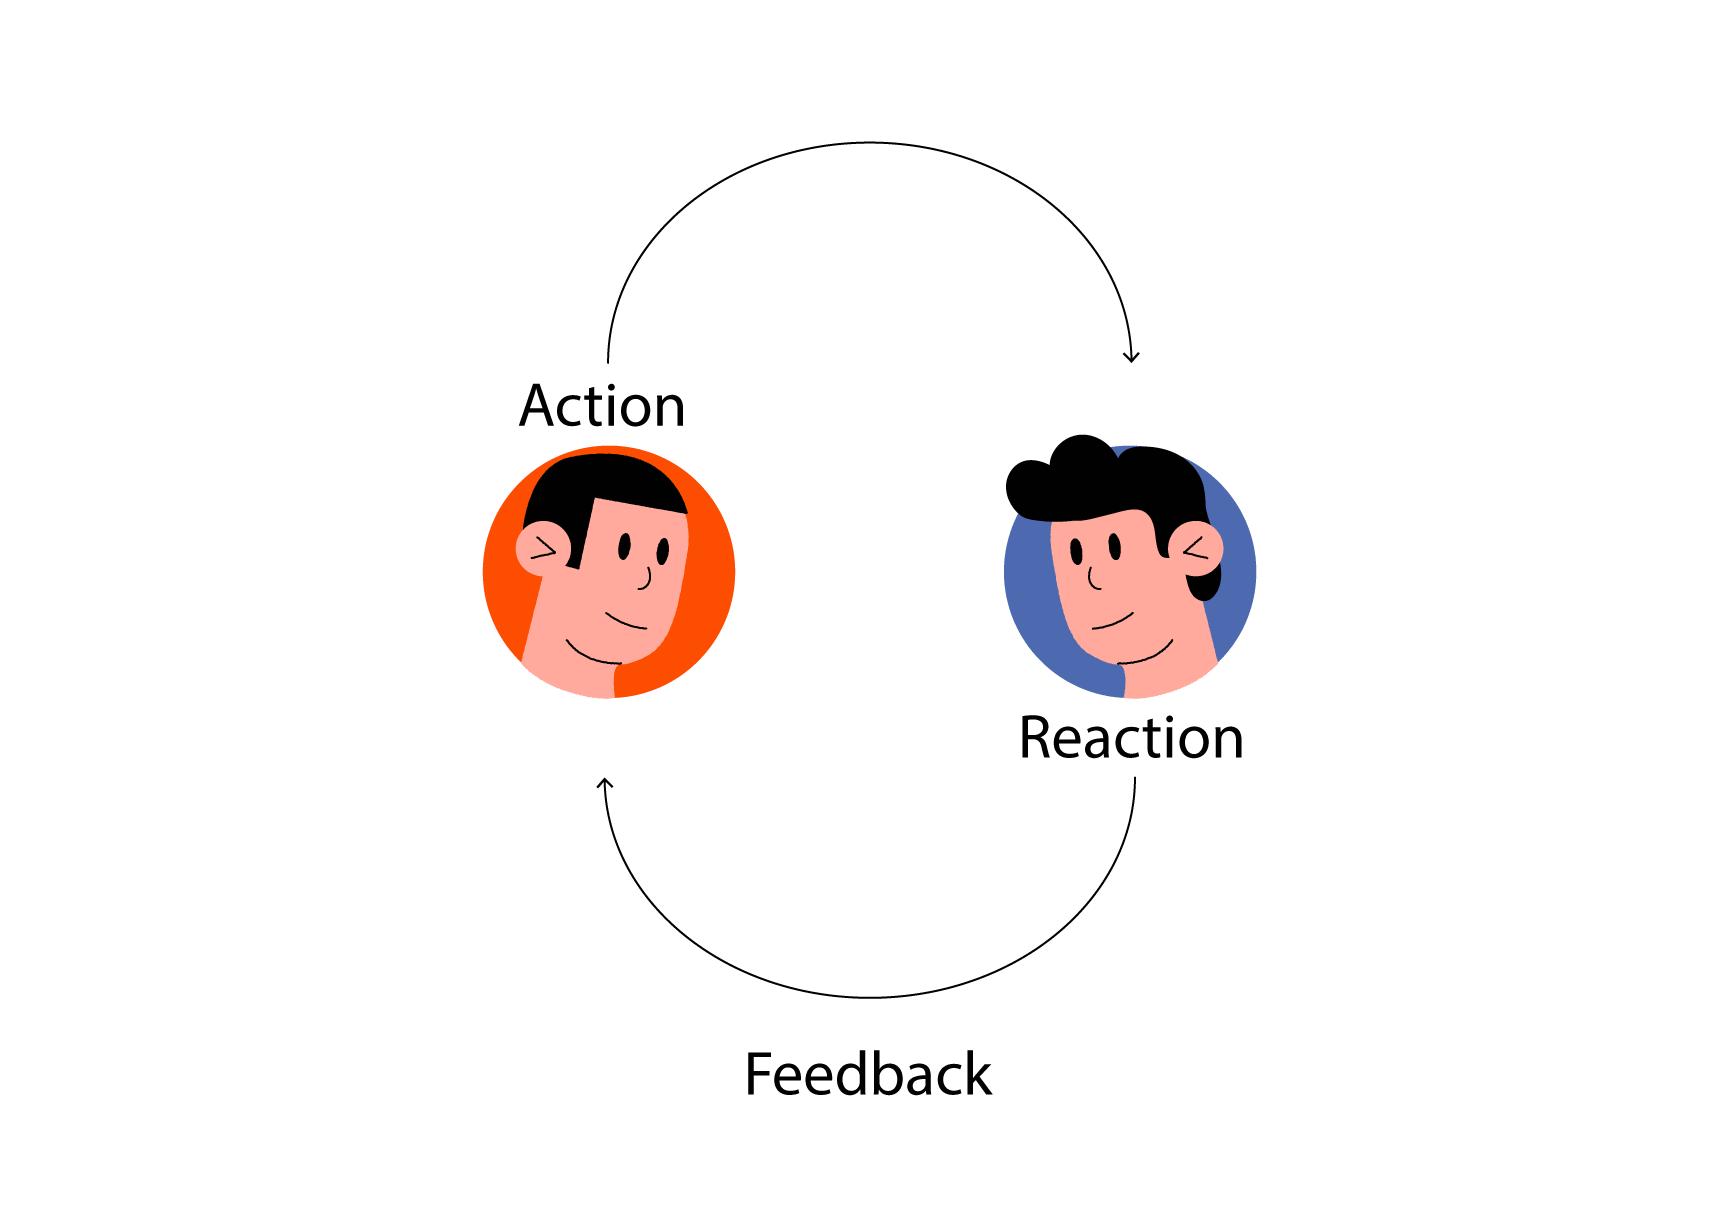 The Feedback Loop scheme